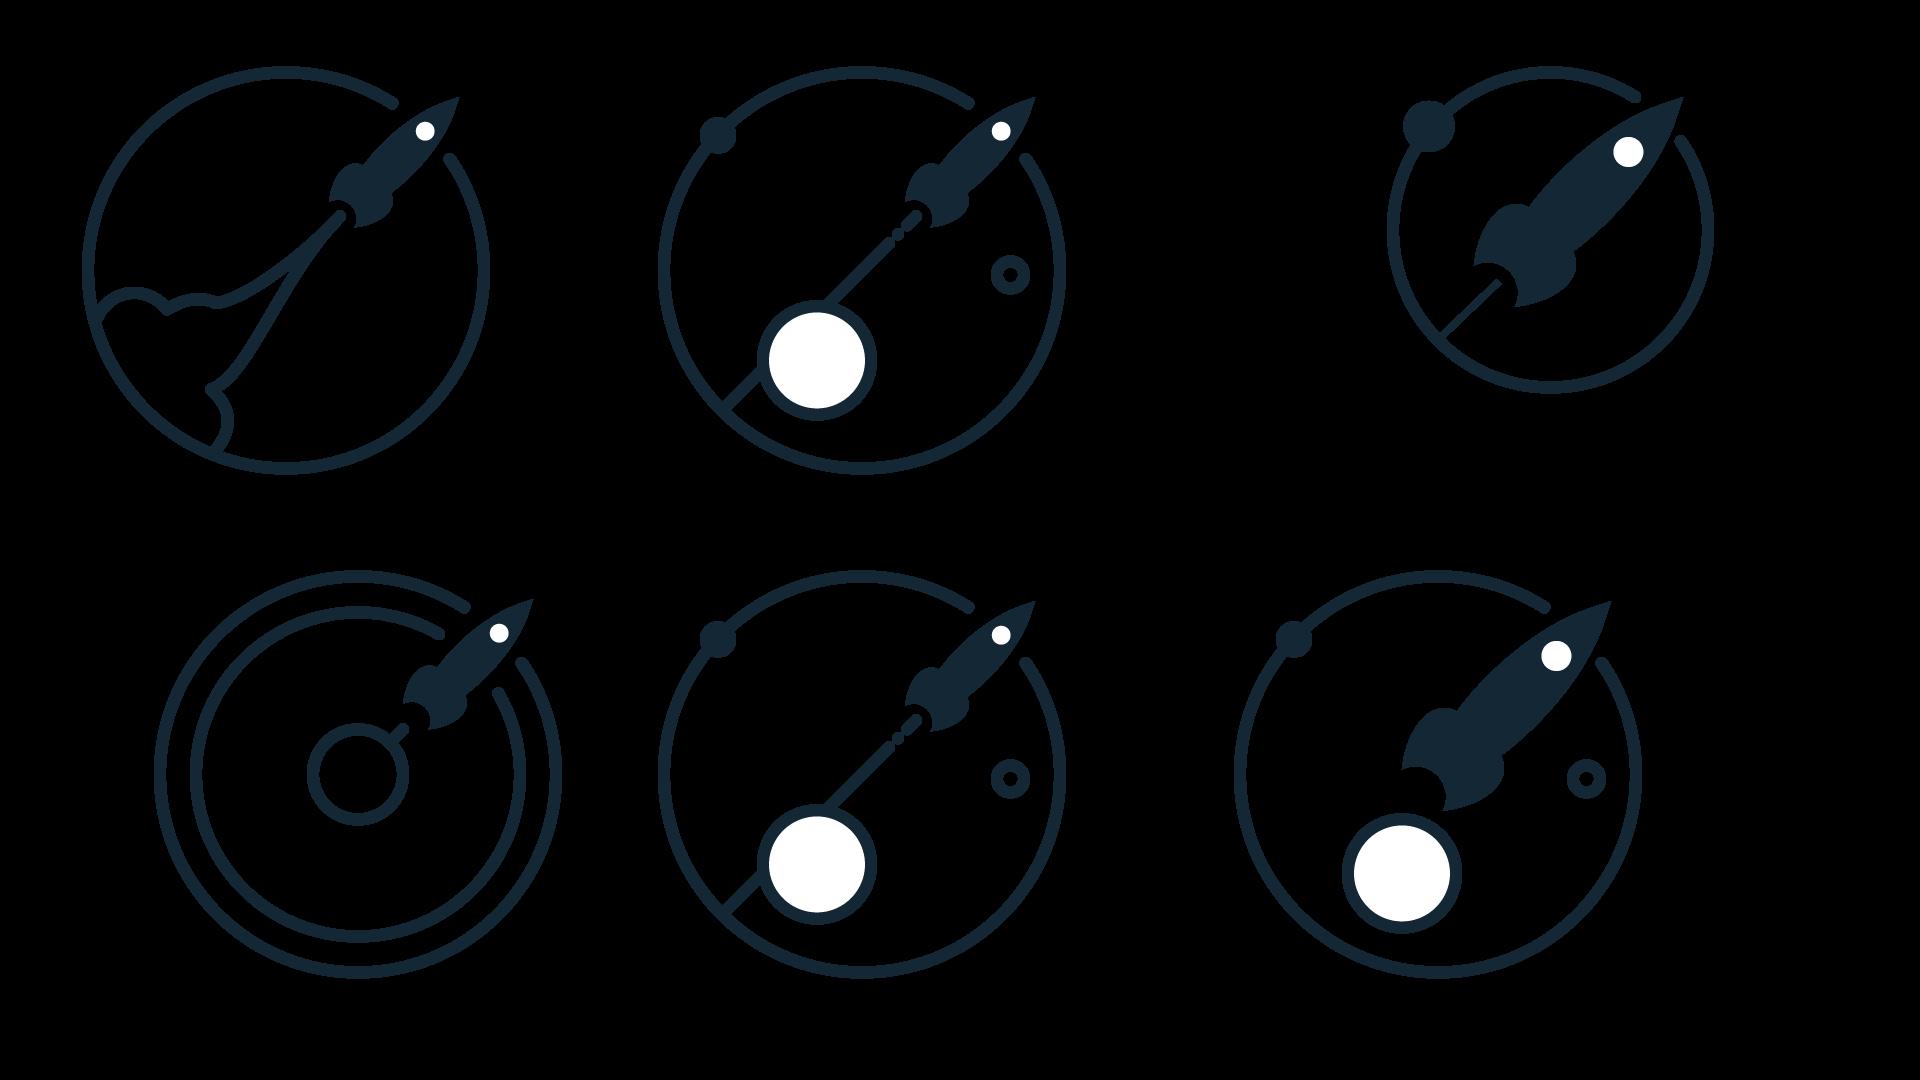 orbit-group4.png